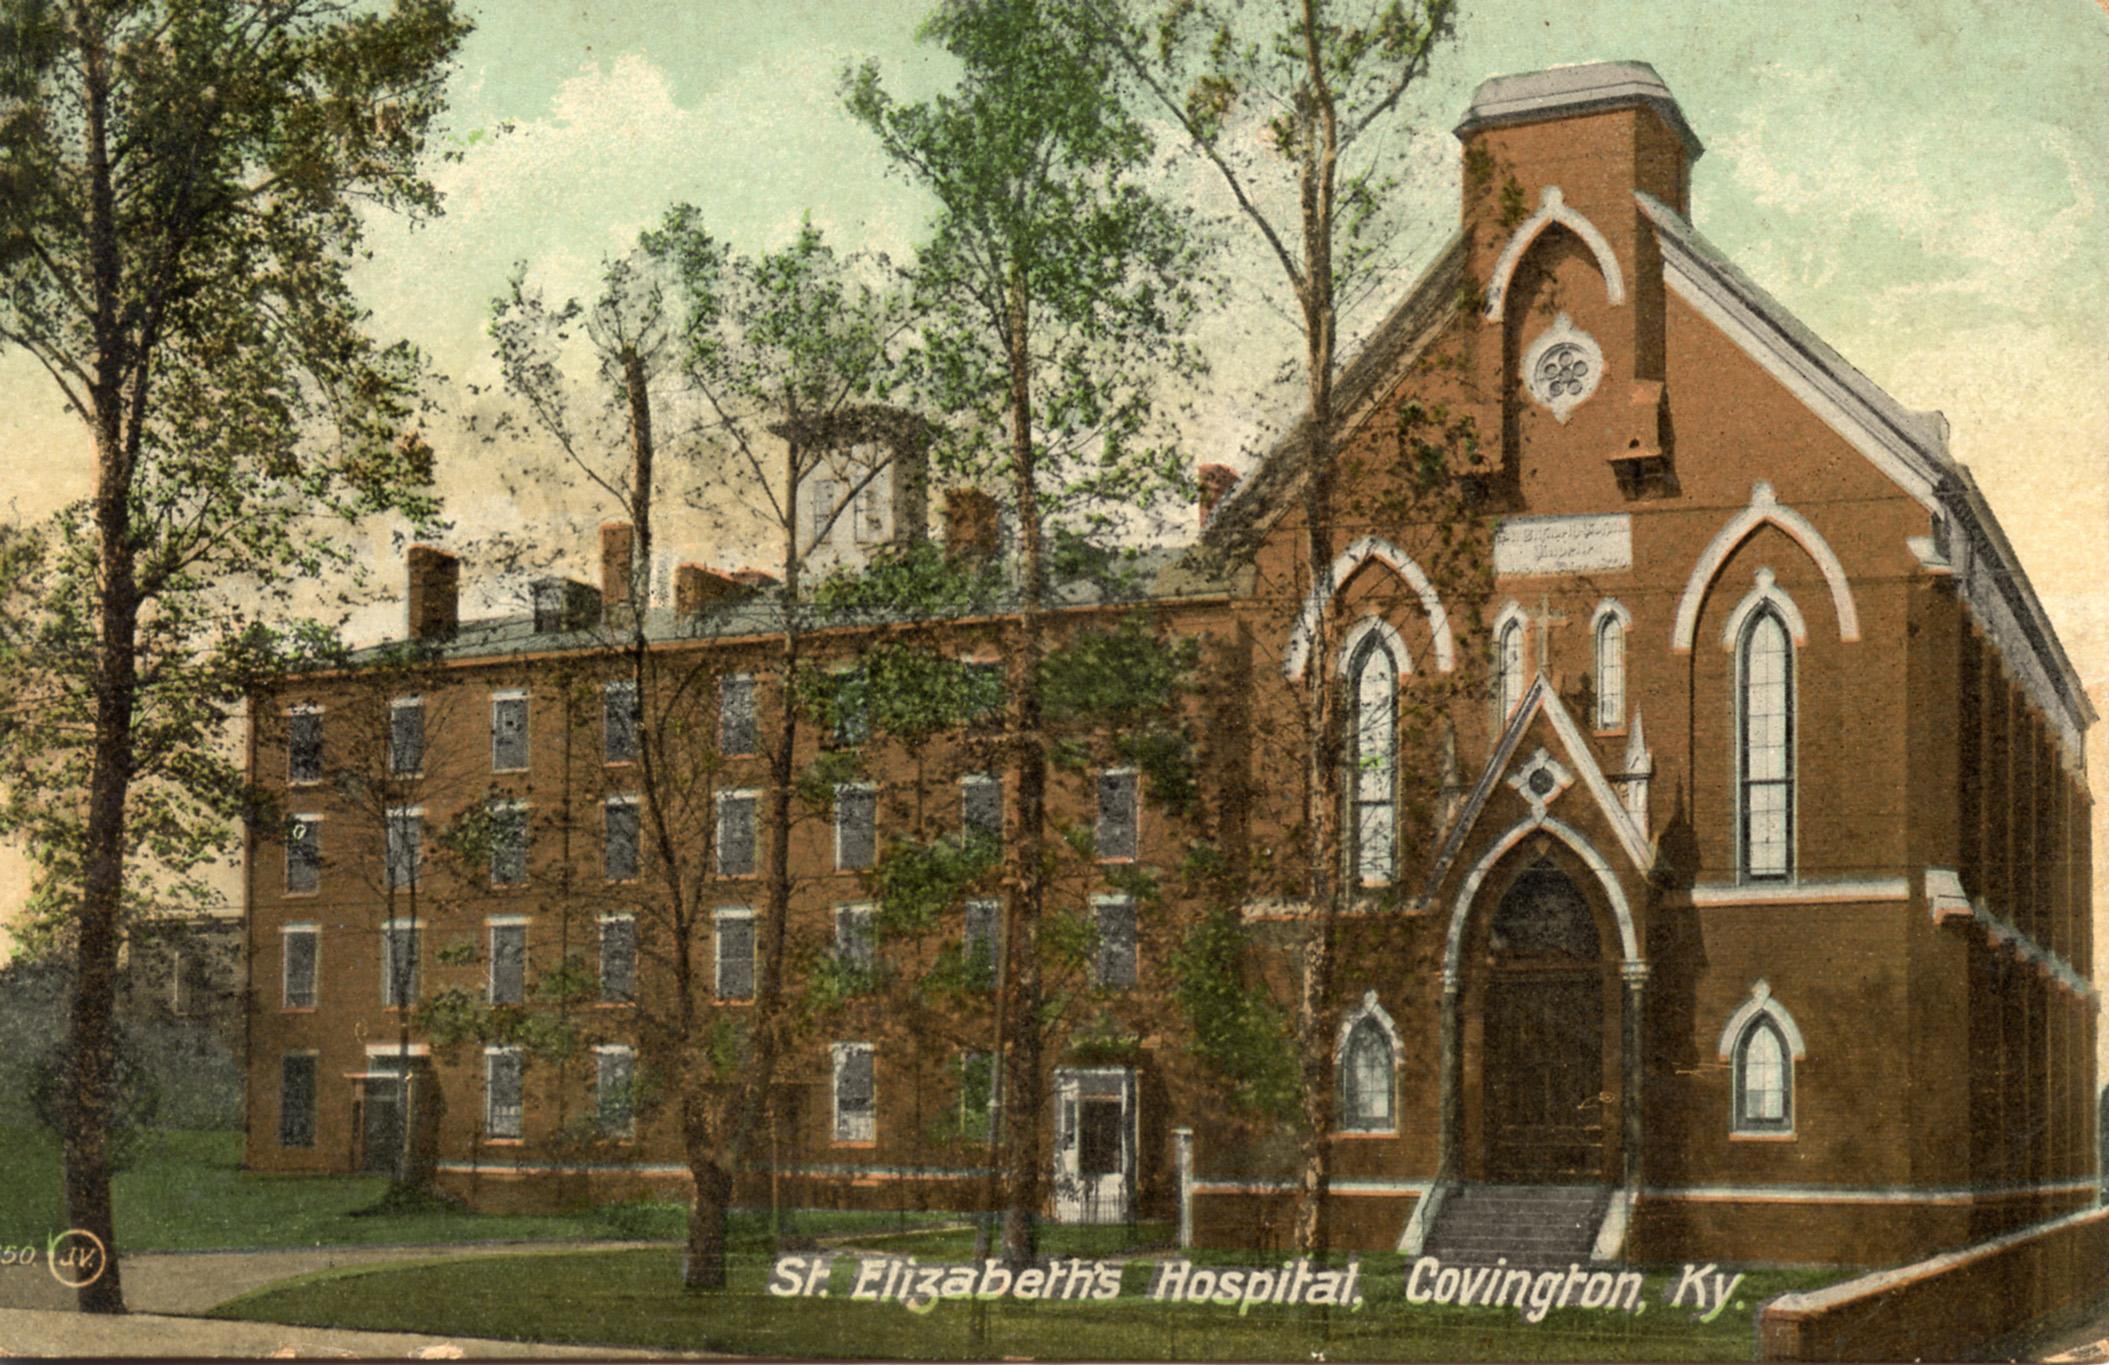 Color postcard of St. Elizabeth Hospital, circa 1909